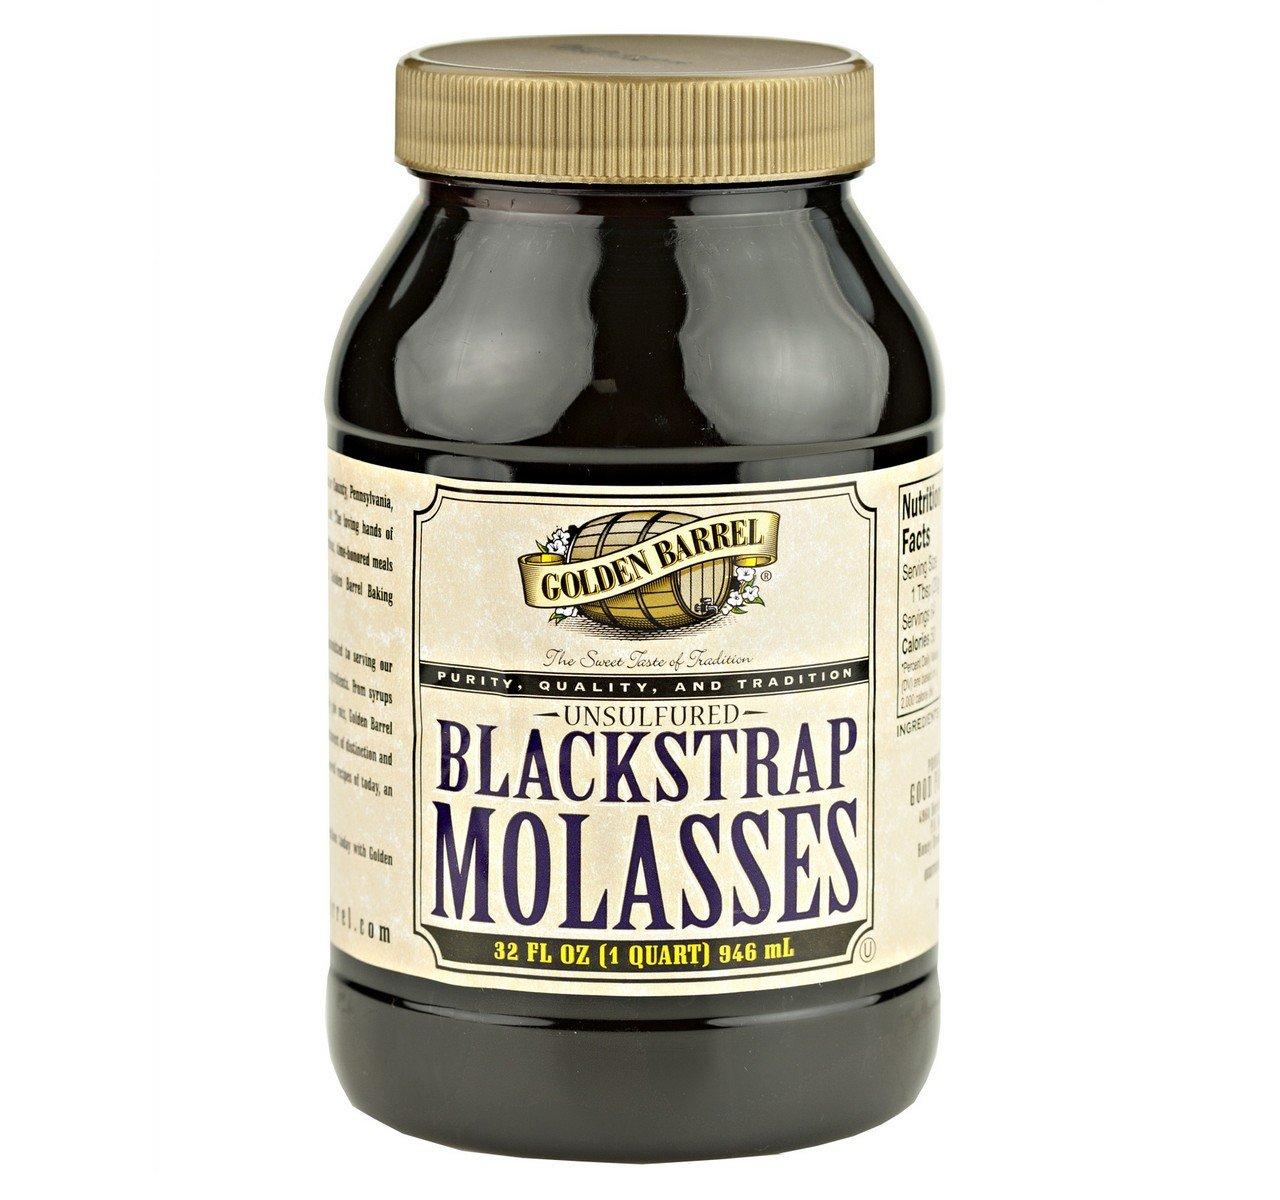 Golden Barrel Unsulfured Black Strap Molasses, 32 Oz. Bottle (Pack of 2)